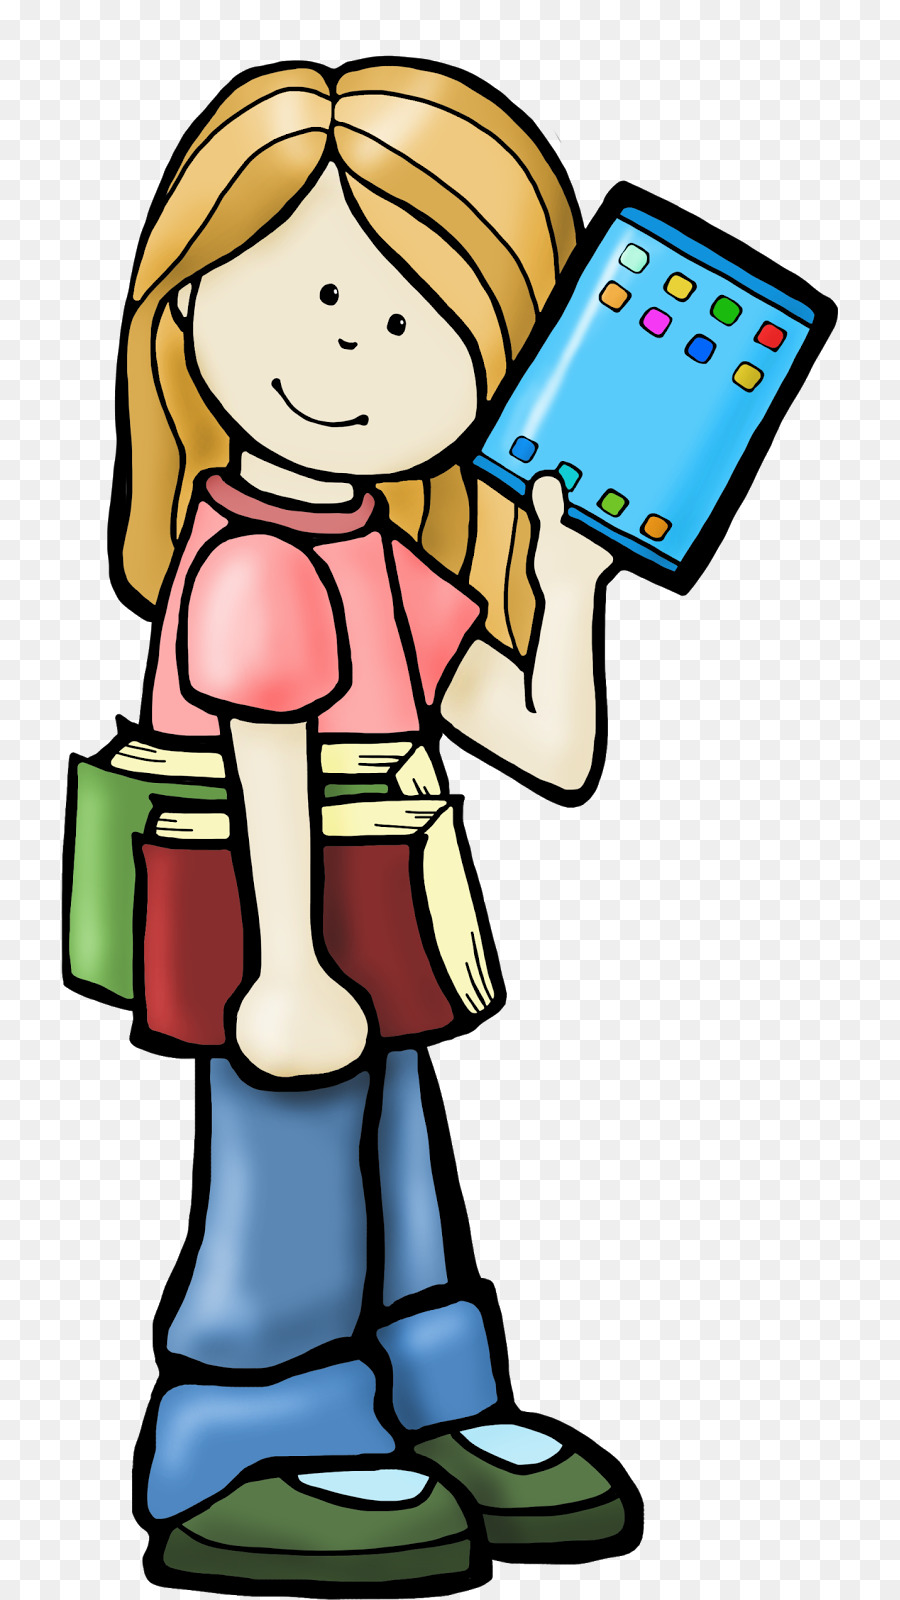 Teacherspayteachers Lesson Plan Pre School Teacher Png Download